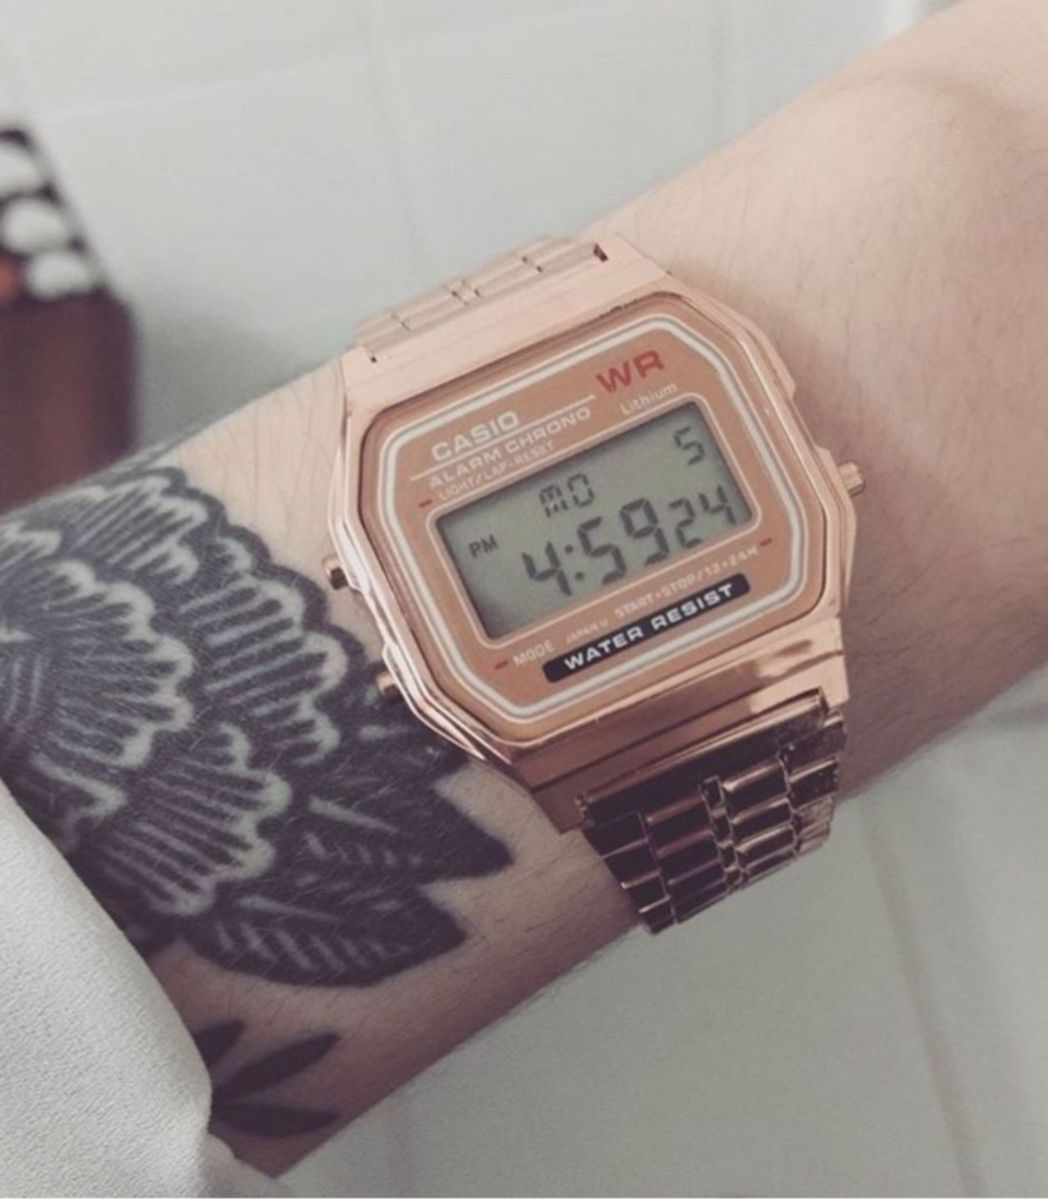 e0db54d6967 relógios casio.  Czm6ly9wag90b3muzw5qb2vplmnvbs5ici9wcm9kdwn0cy85ntcymti3lzq0ytyzywvkm2y3mdnkndc4nwu0nmiyy2zhywjmndcwlmpwzw